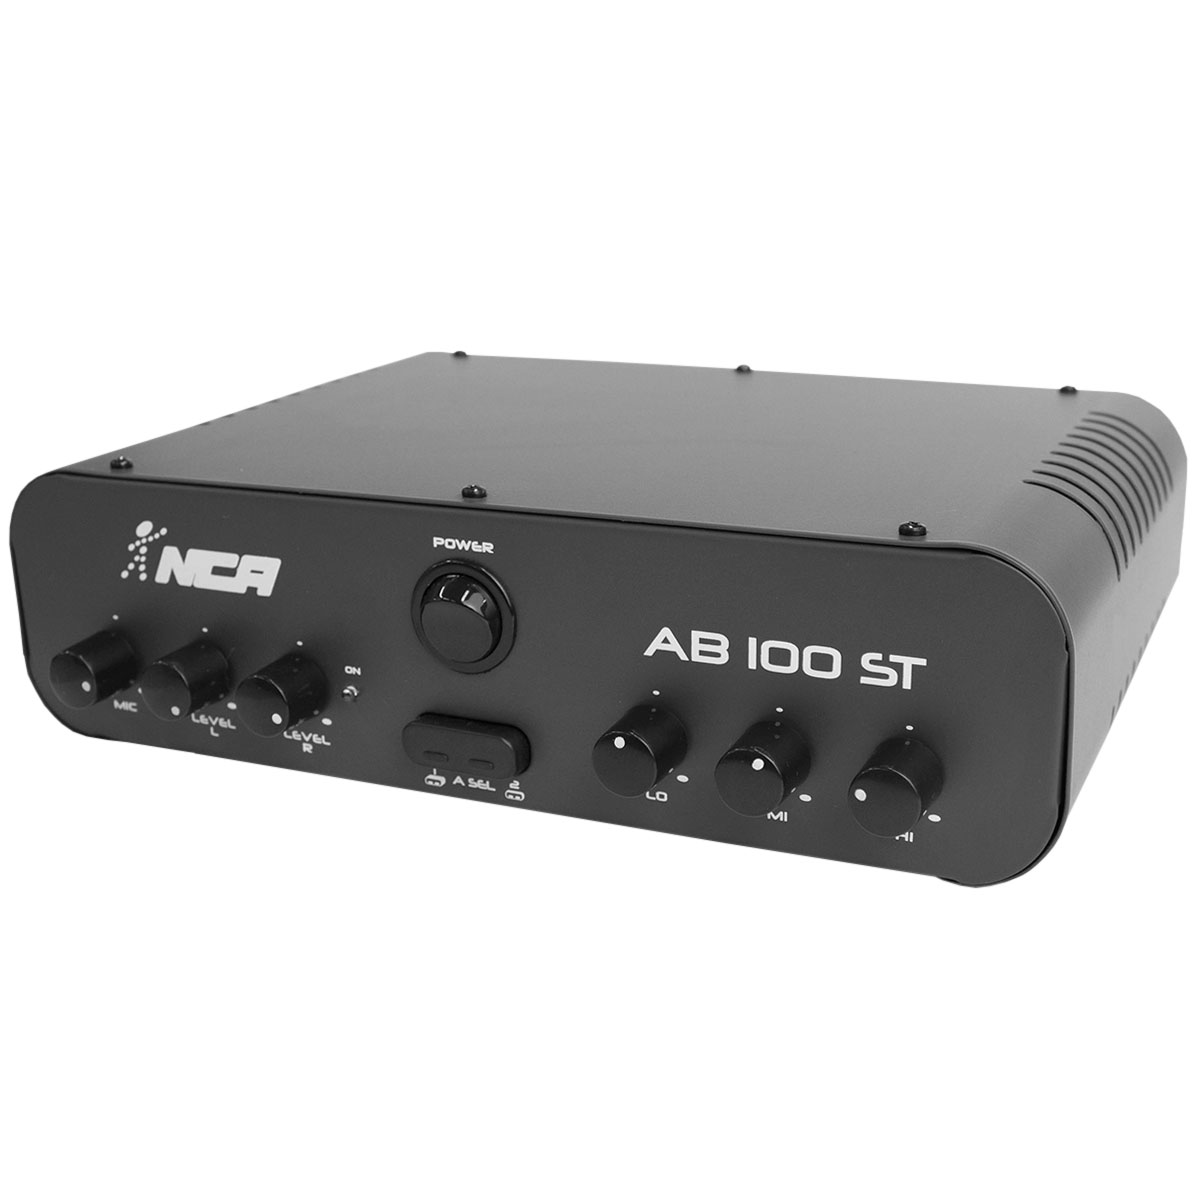 AB100ST - Amplificador Som Ambiente Estéreo 60W AB 100 ST - NCA